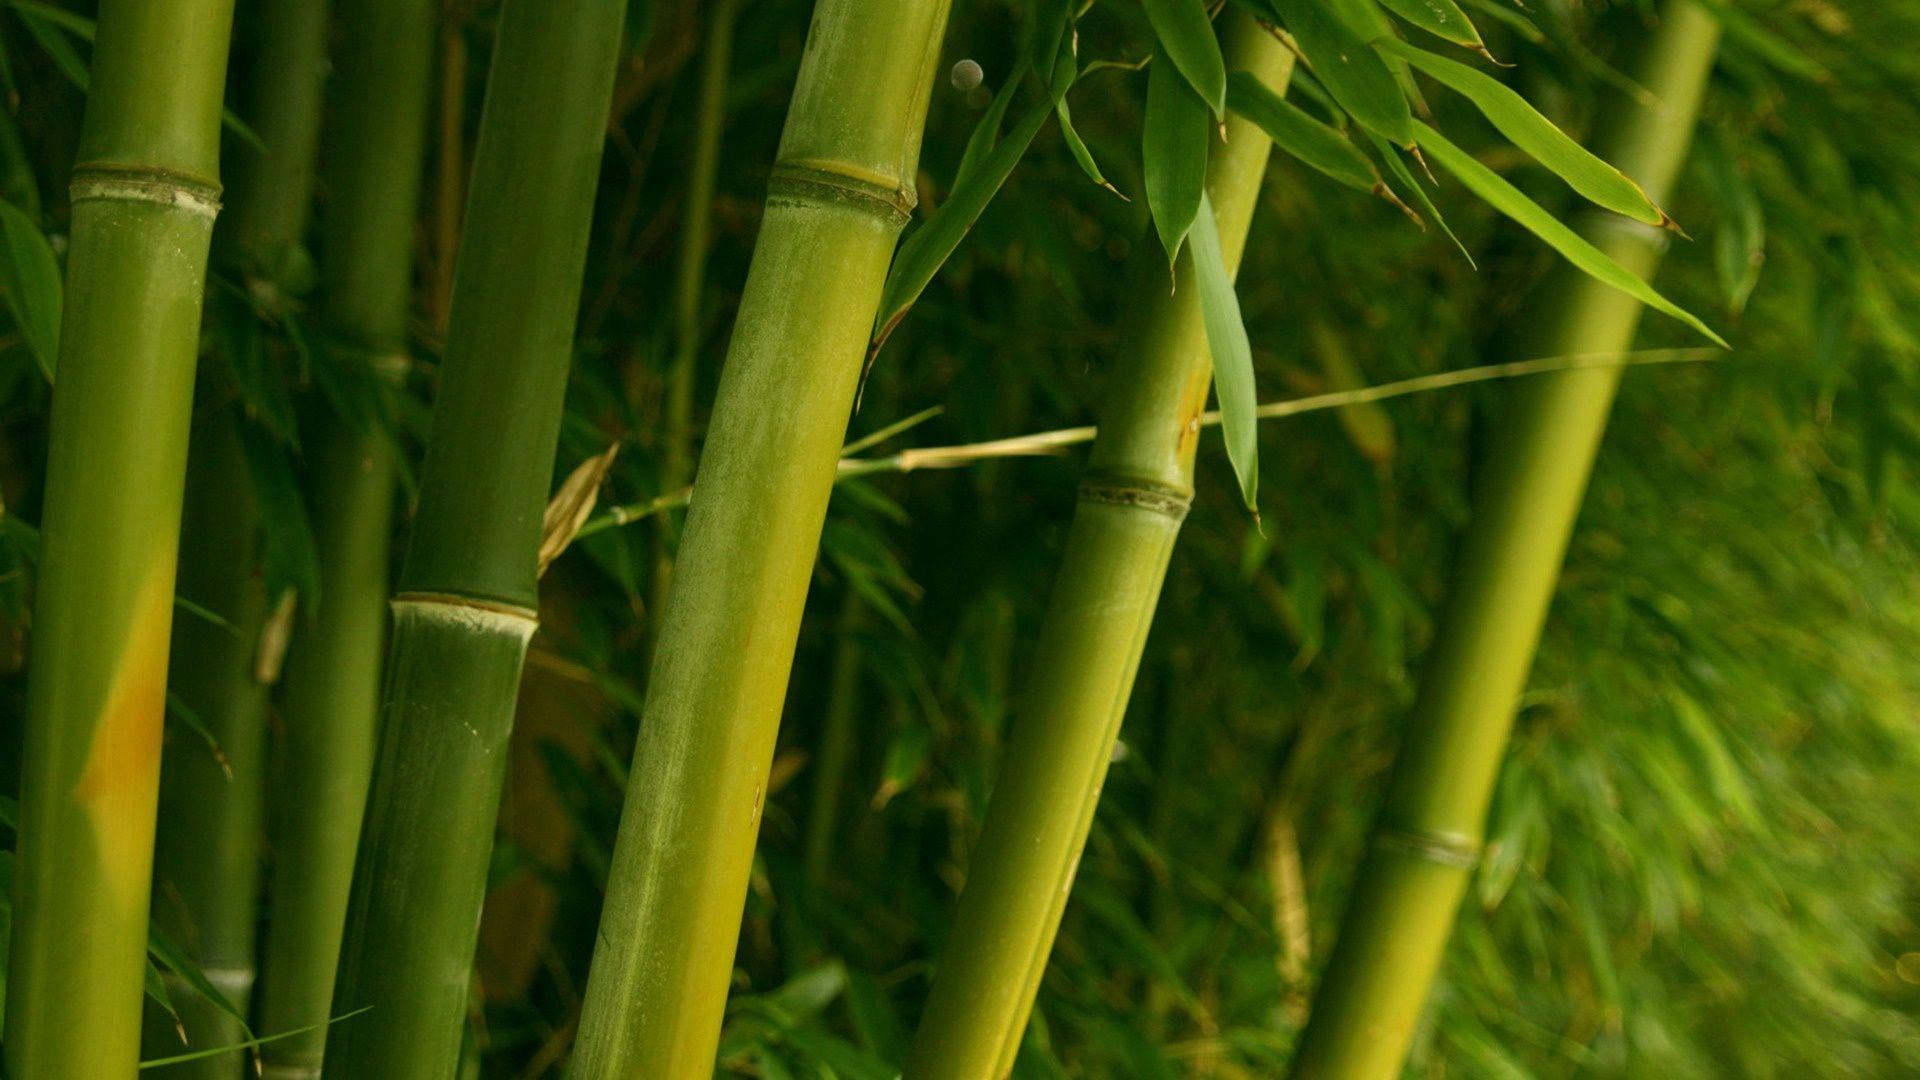 Free Hd Bamboo Wallpapers Bamboo Stalks Bamboo Wallpaper